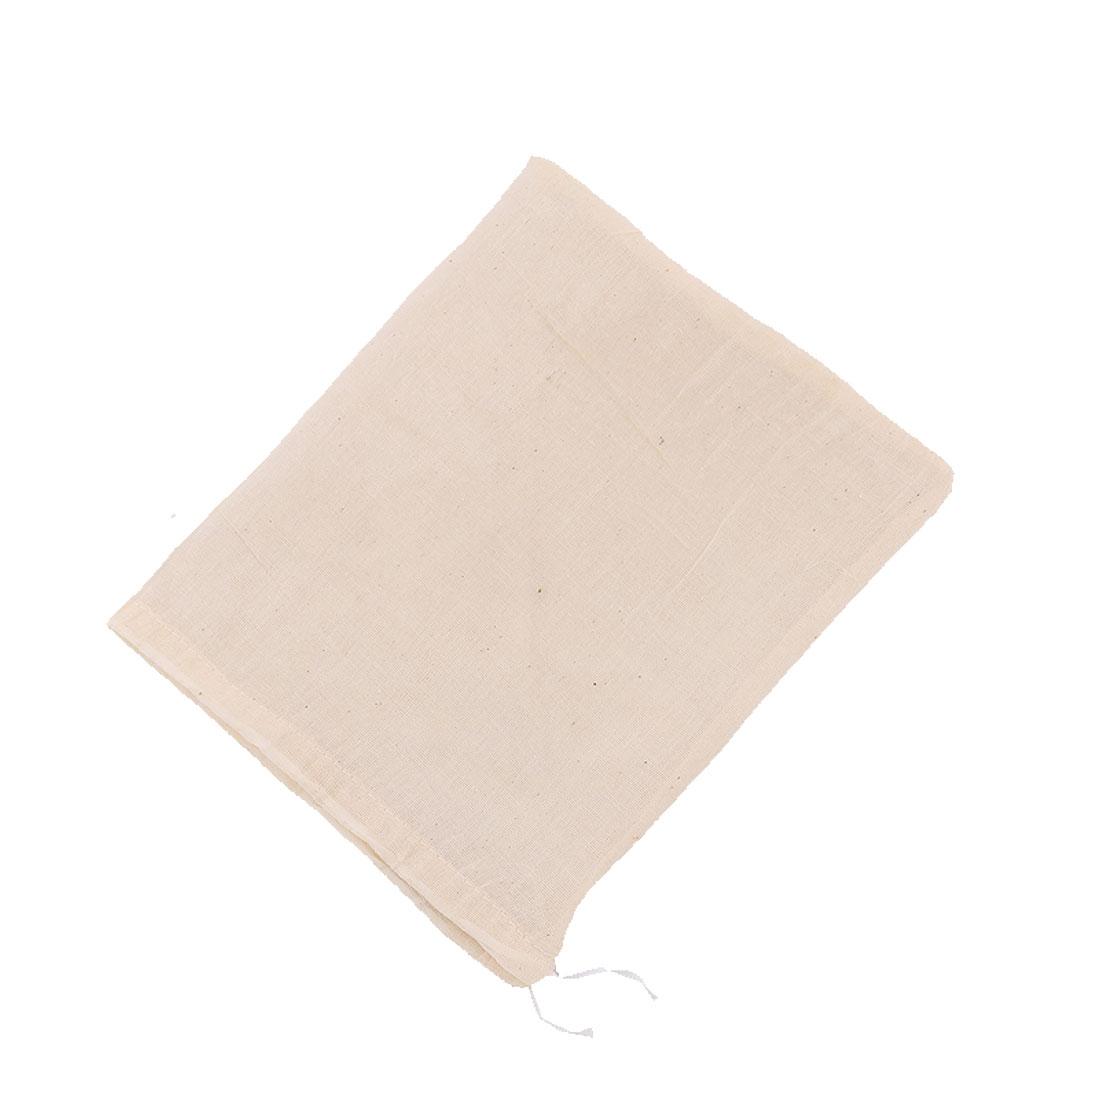 Fabric Drawstring Closure Design Reusable Food Soup Filter Bag Beige